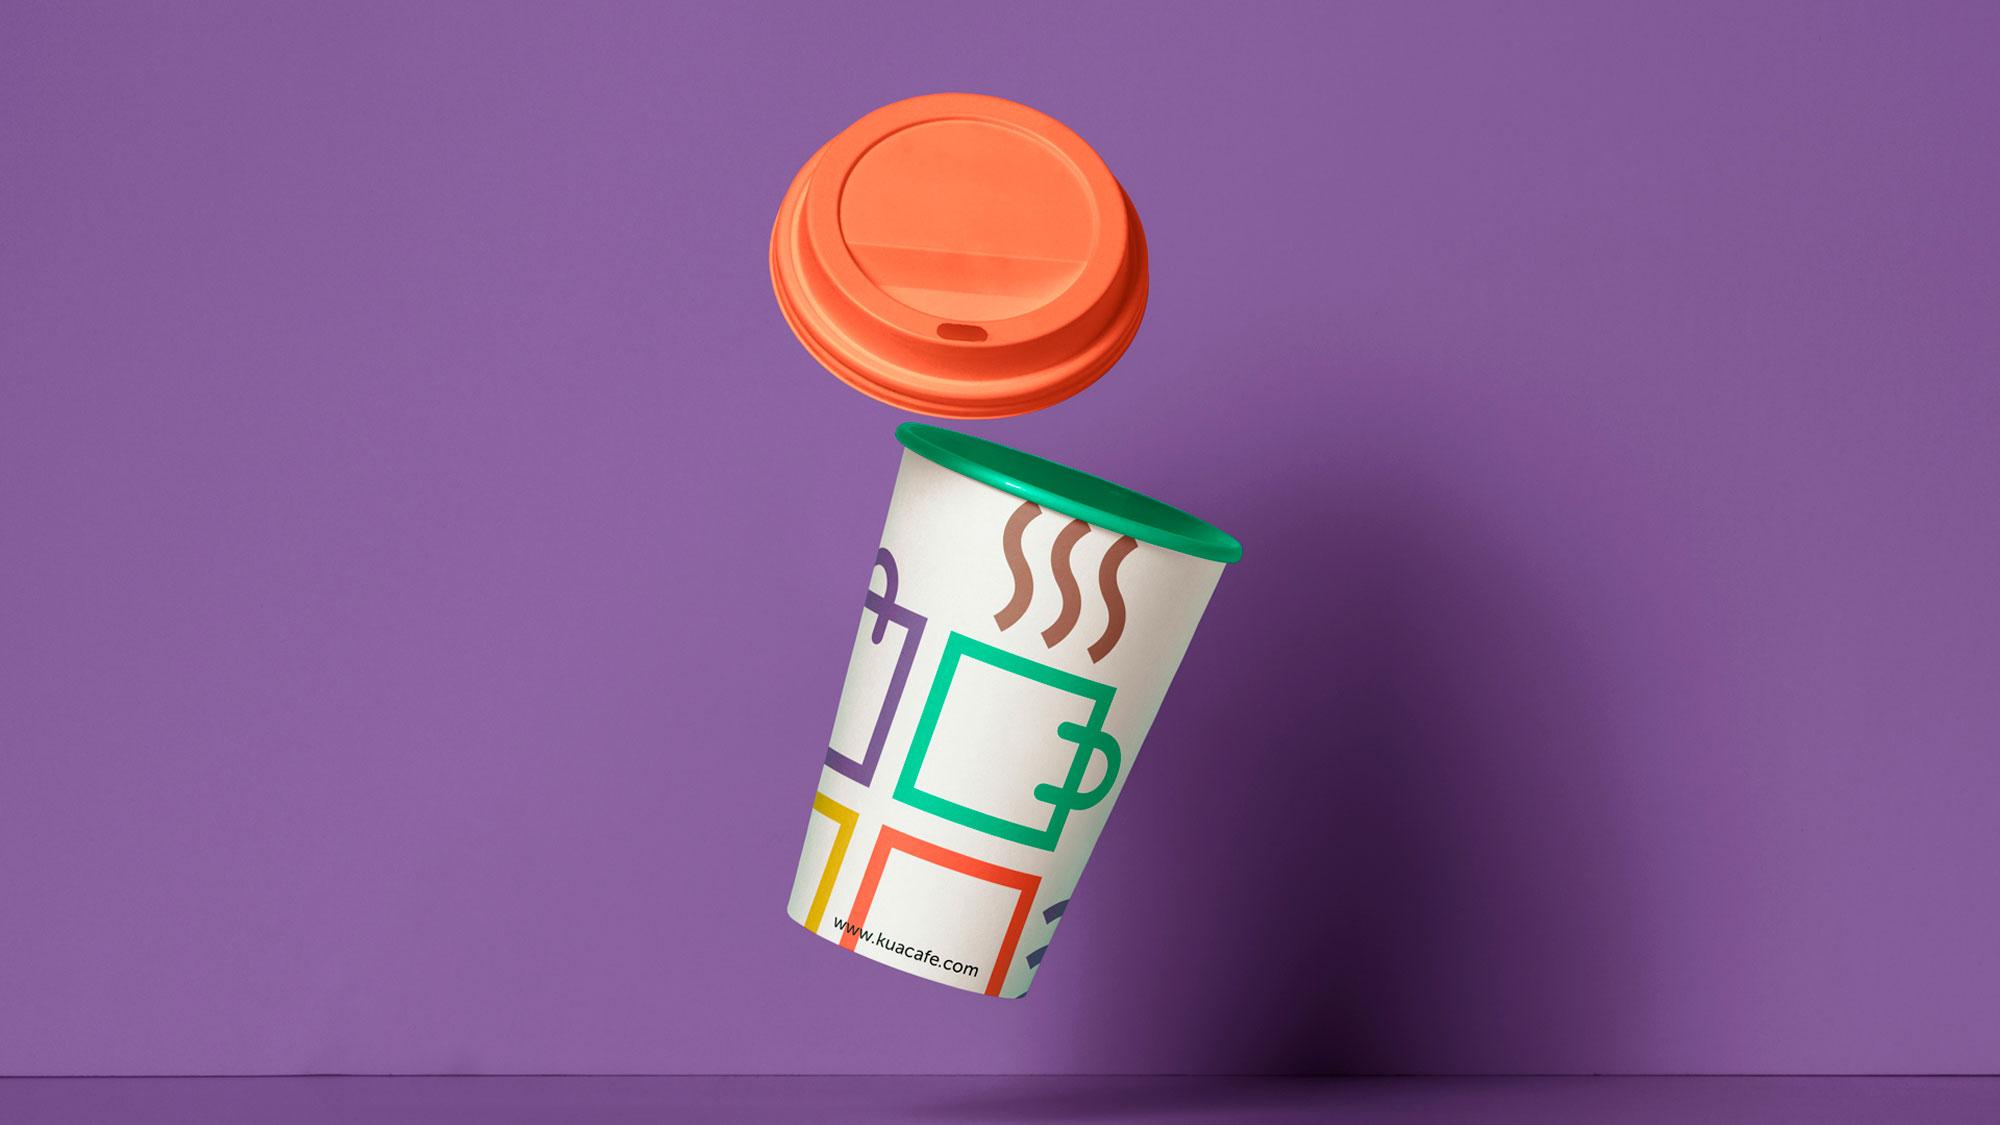 boom-agencia-marketing-digital-branding-kua-cafe-tienda-online-vaso-brandeado